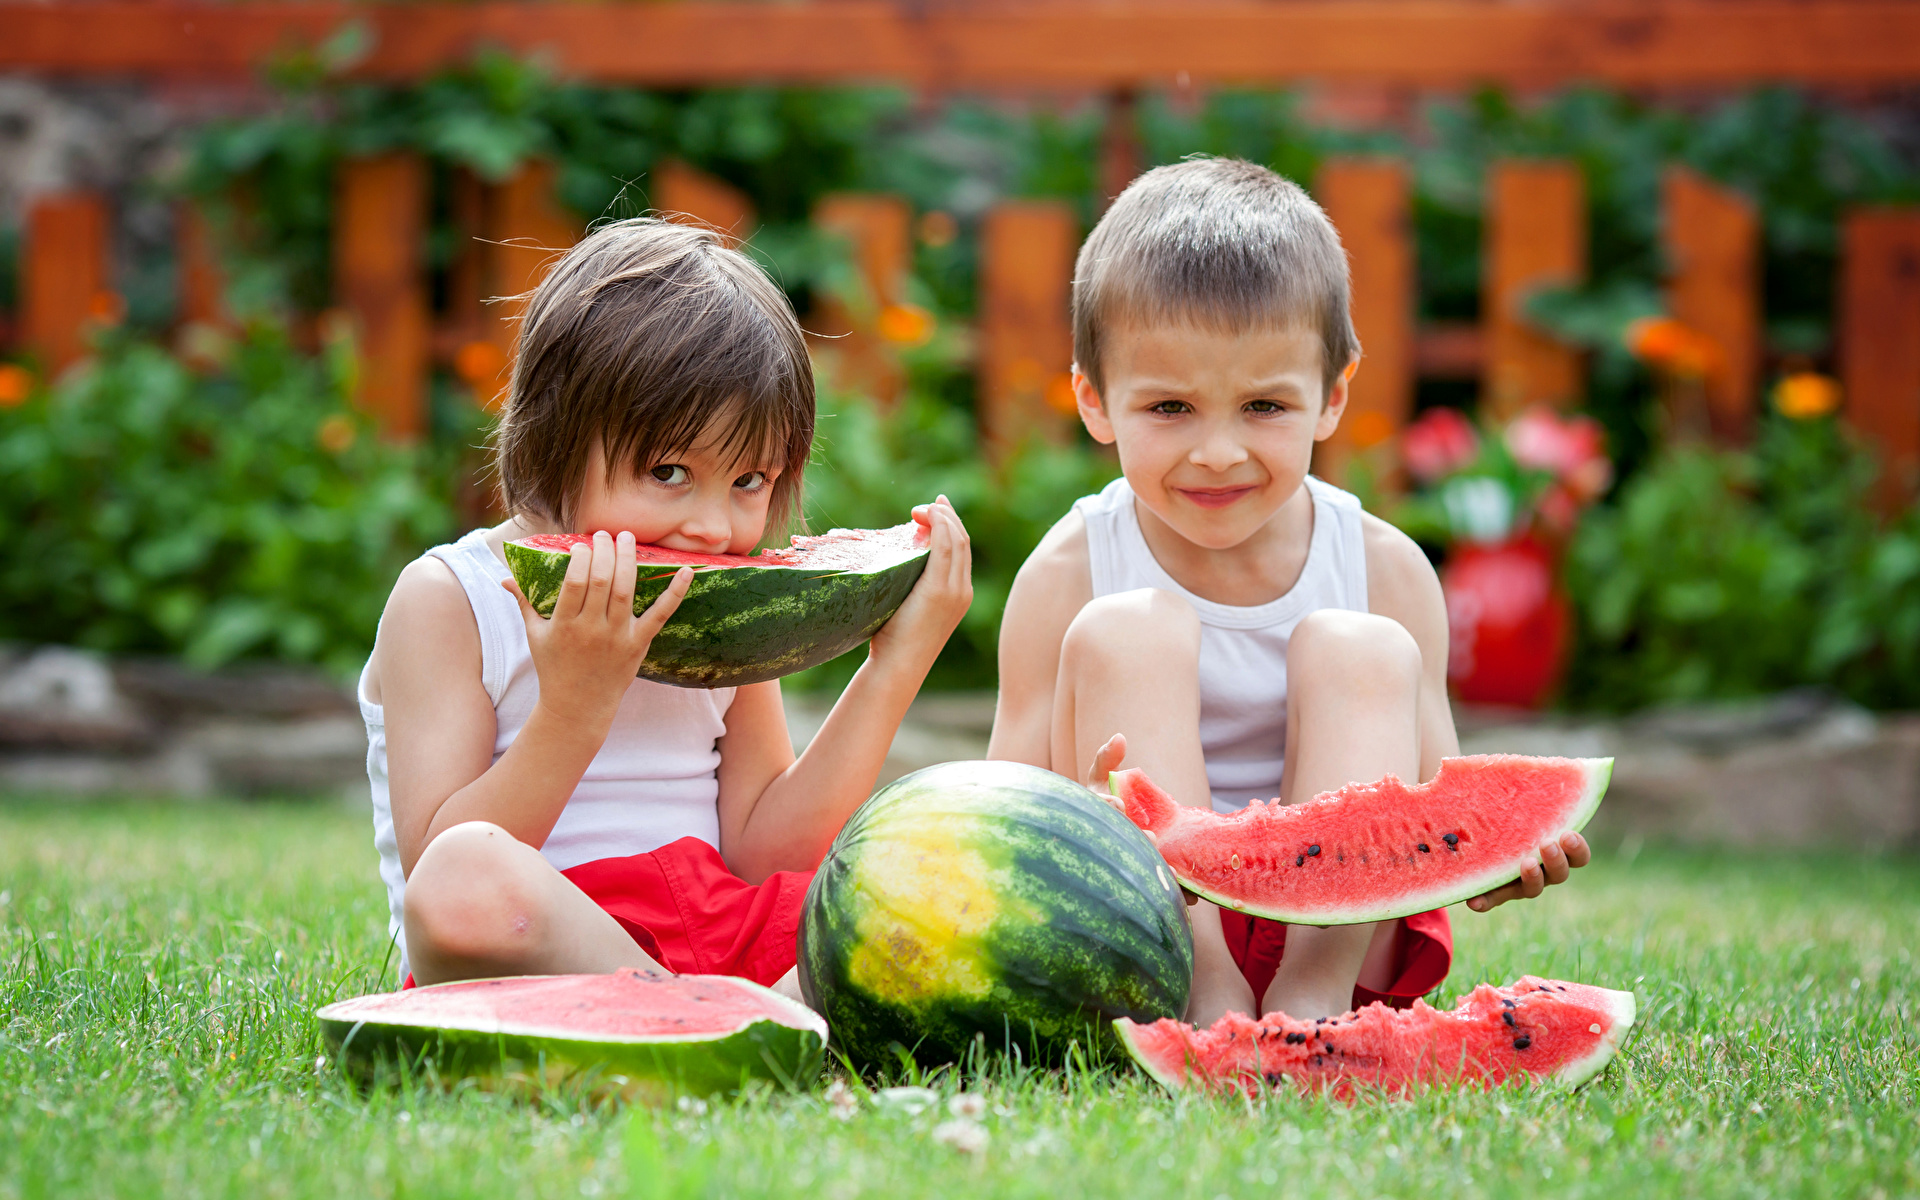 Picture Boys child Two Piece Watermelons Grass 1920x1200 Children 2 pieces